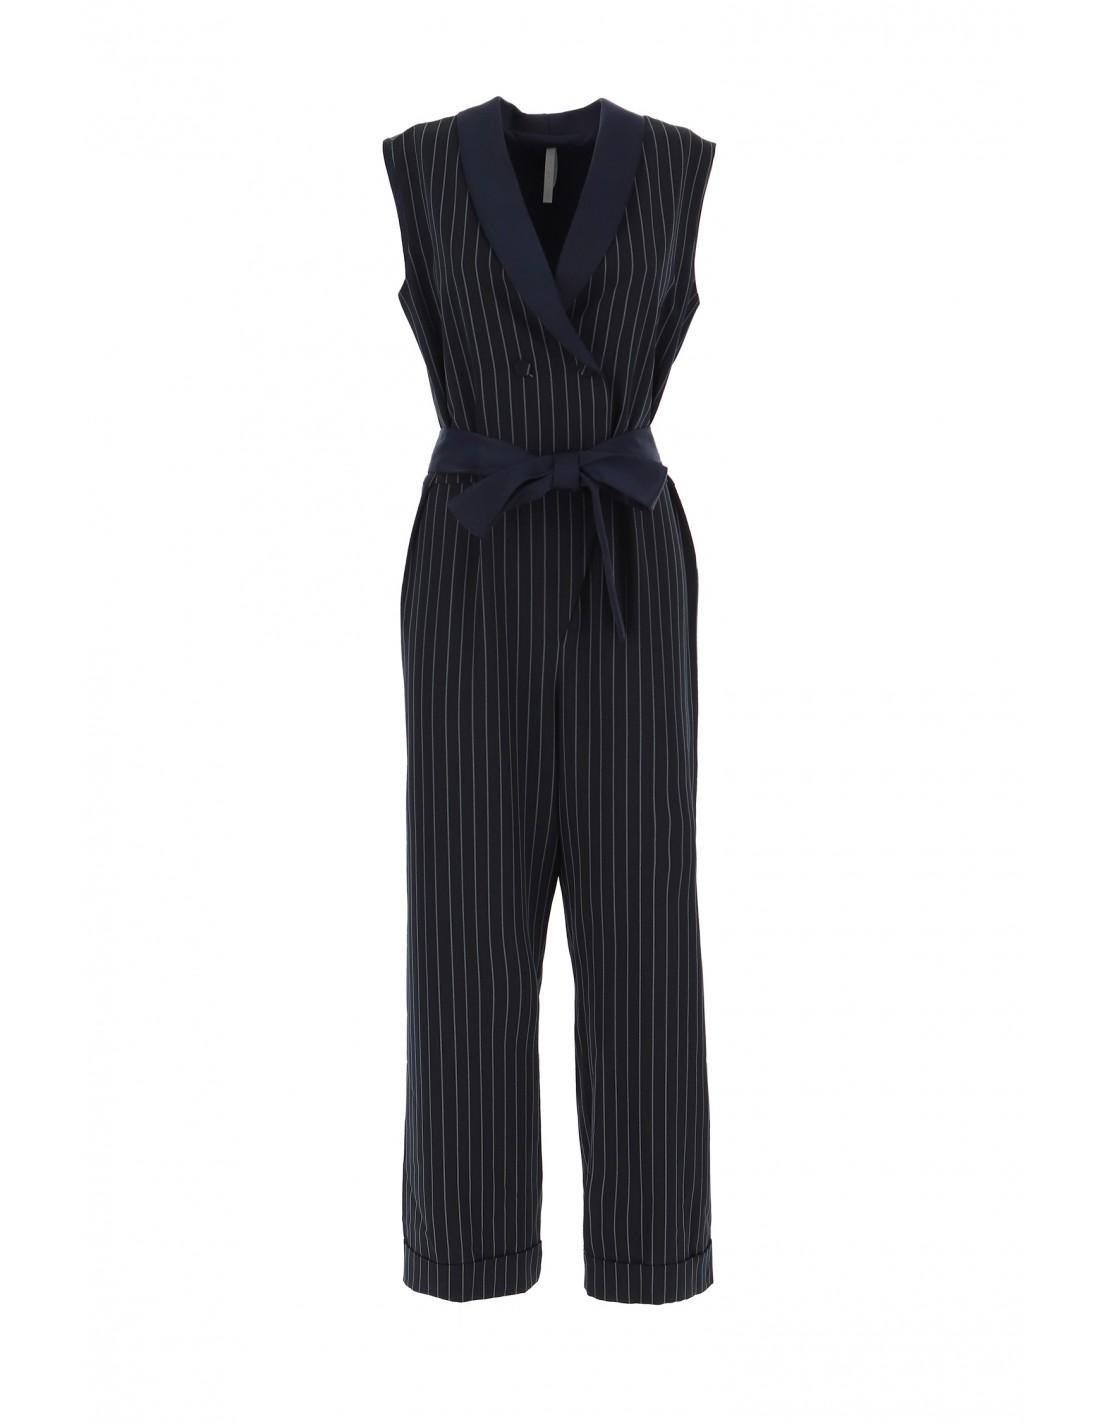 combi pantalon imperial croisee bleu marine rayee. Black Bedroom Furniture Sets. Home Design Ideas